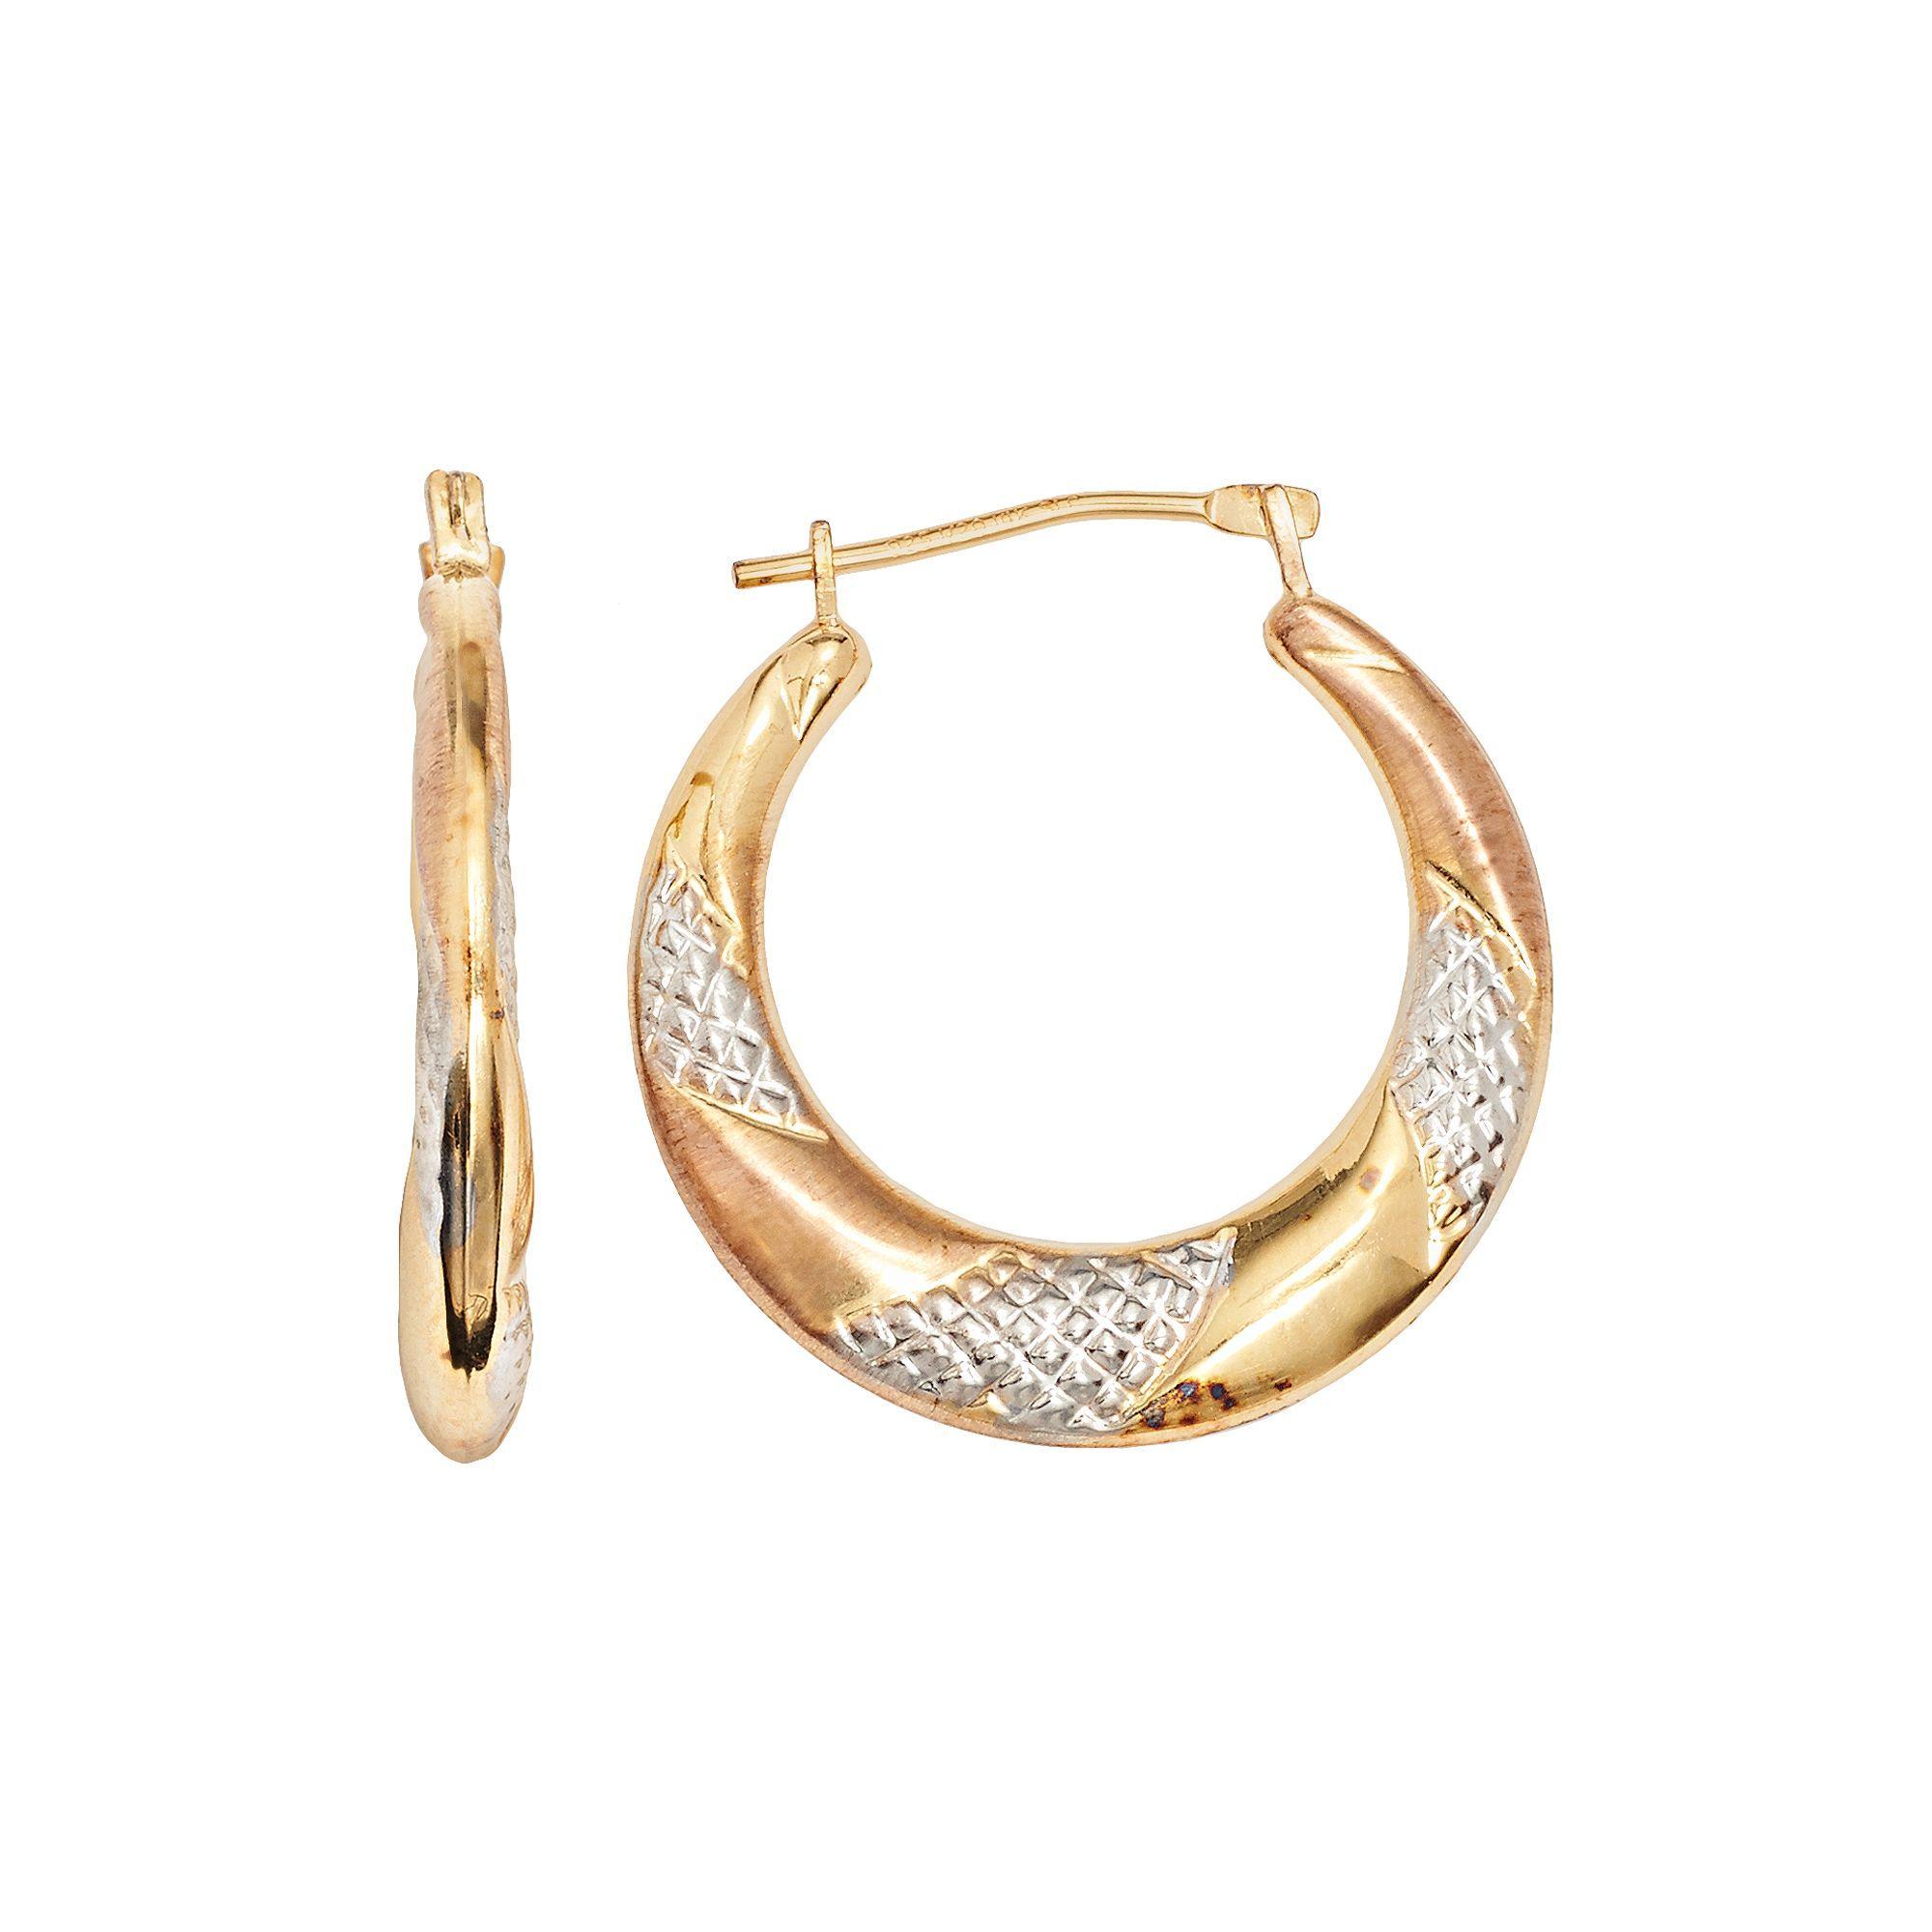 14k Gold Bonded Sterling Silver Tri Tone Twist Hoop Earrings